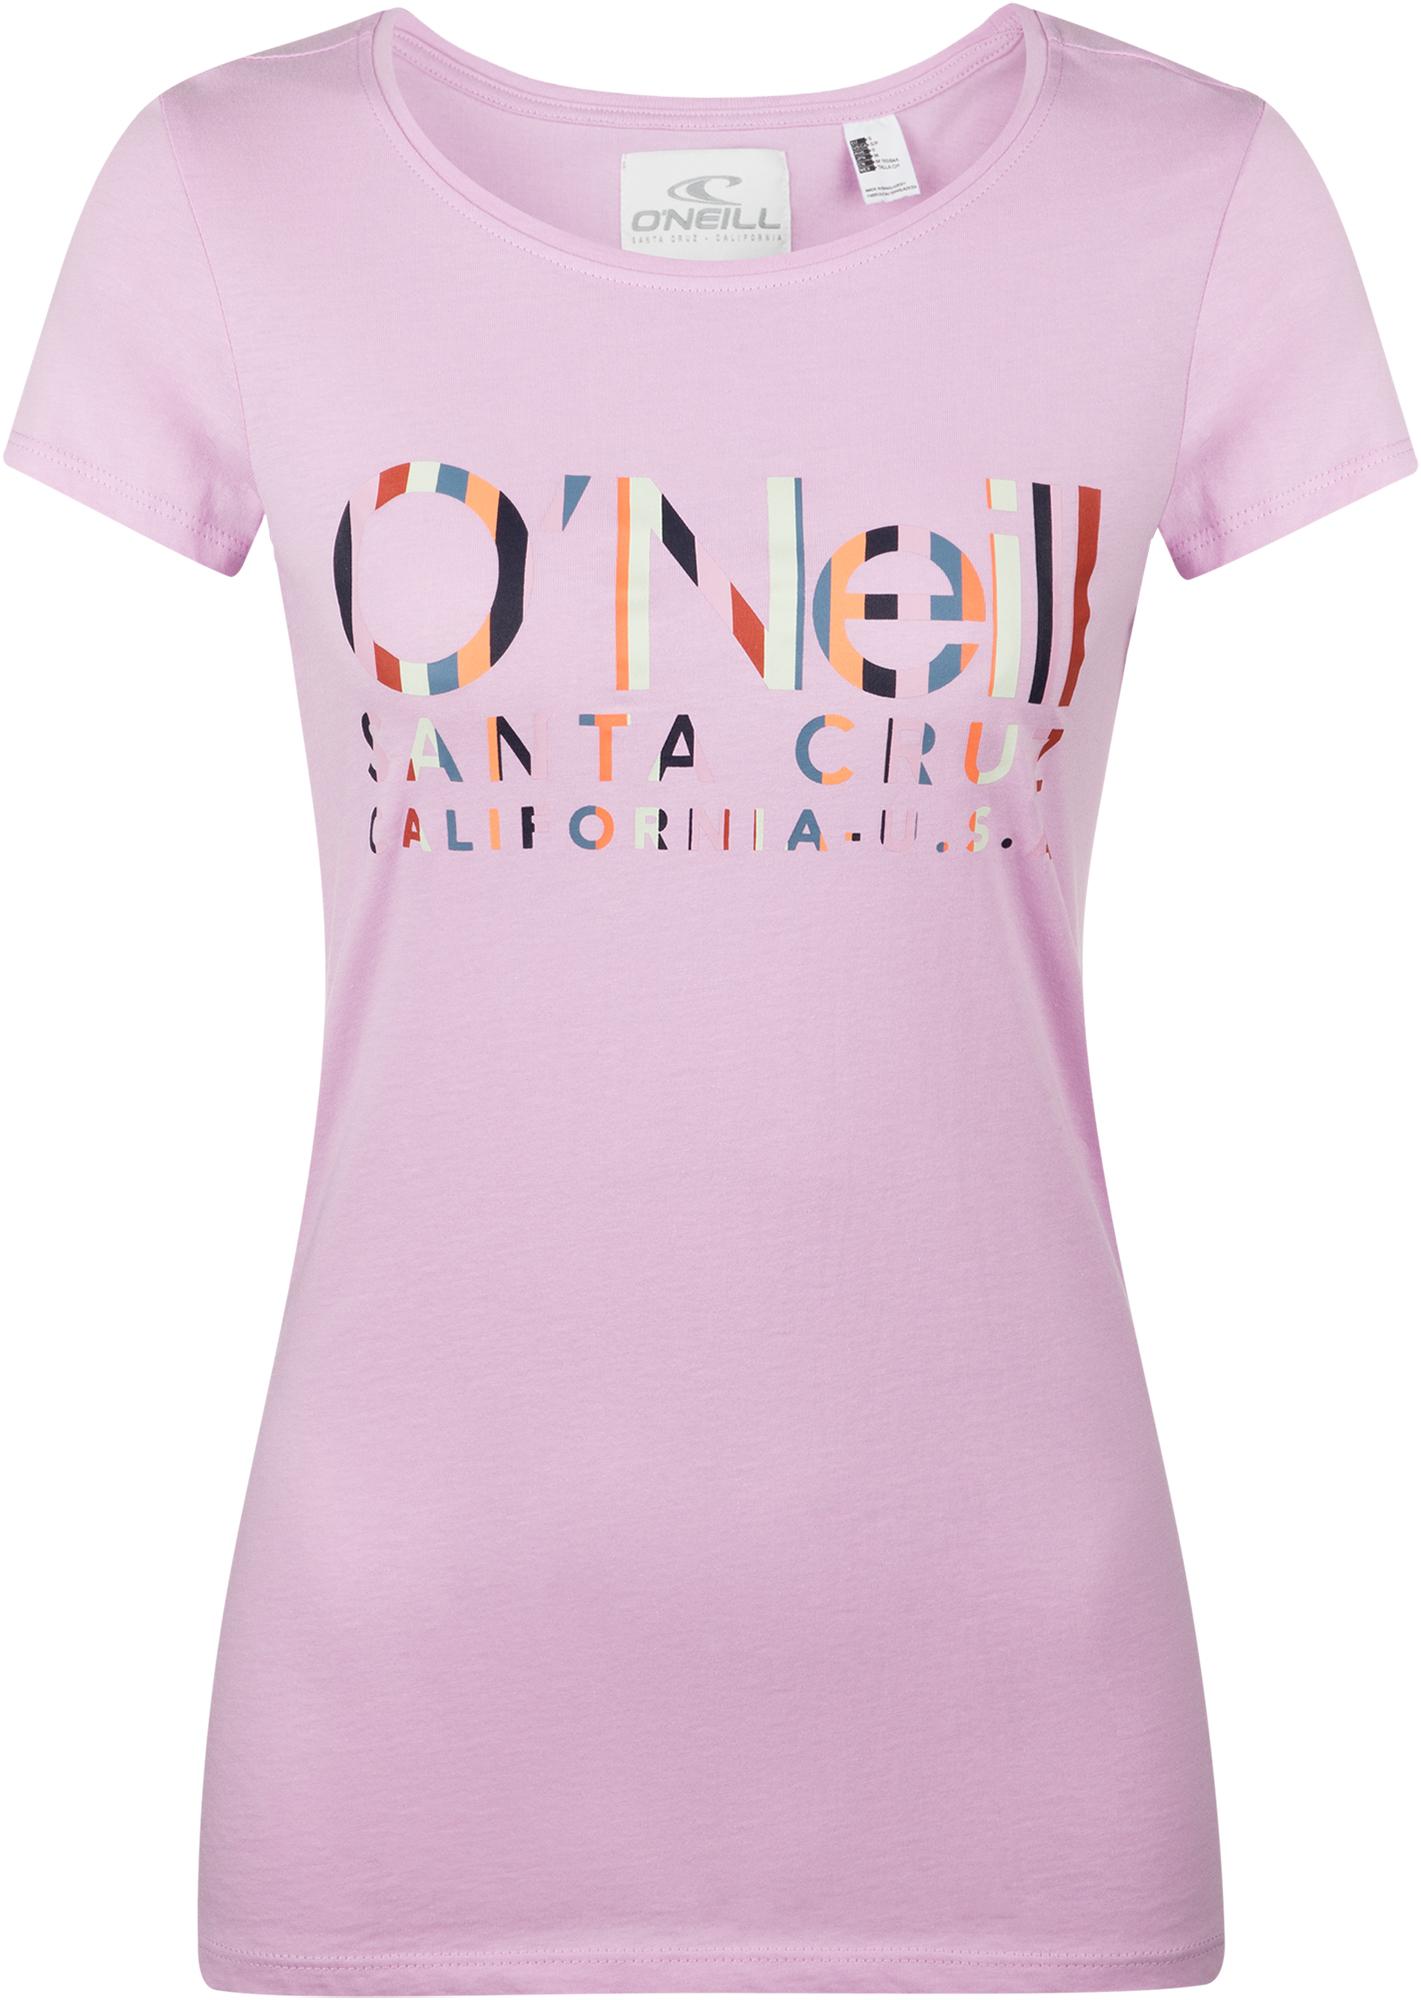 O'Neill Футболка женская O'Neill Cali, размер 50-52 o neill шорты пляжные мужские o neill cali размер 54 56